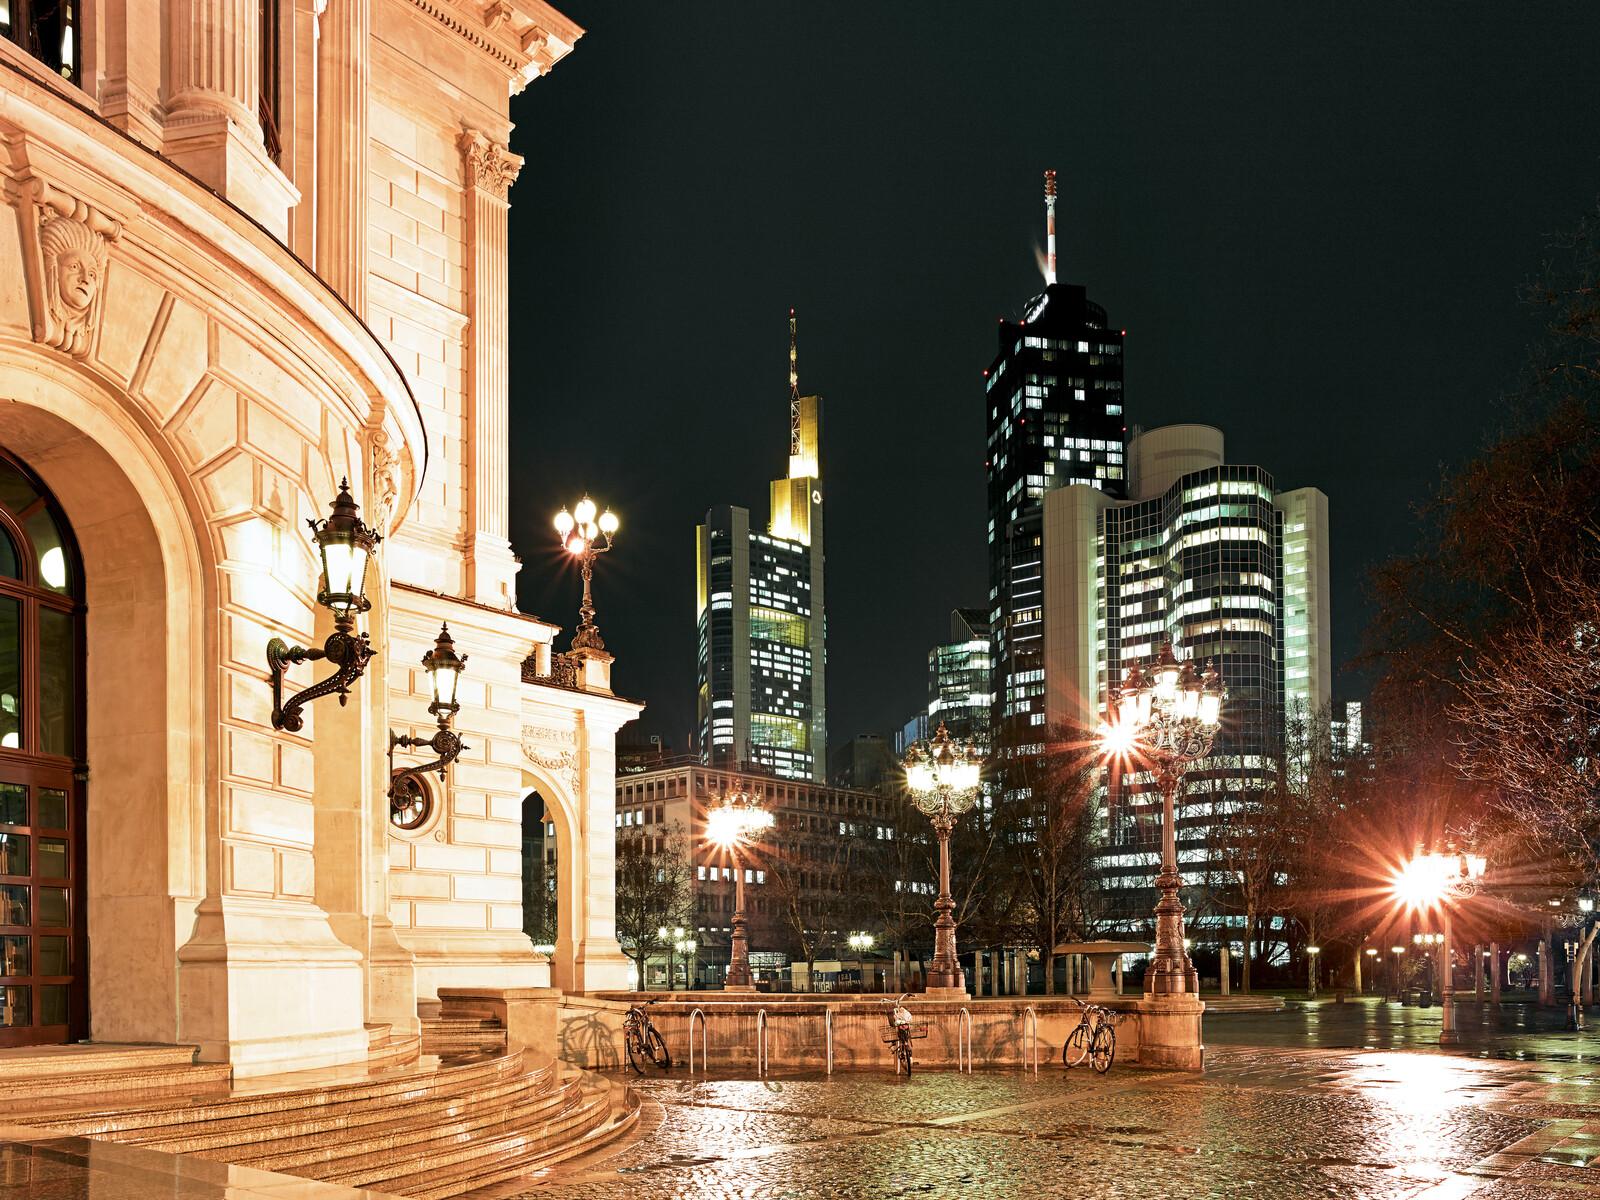 Urban Nights V - Horst & Daniel  Zielske